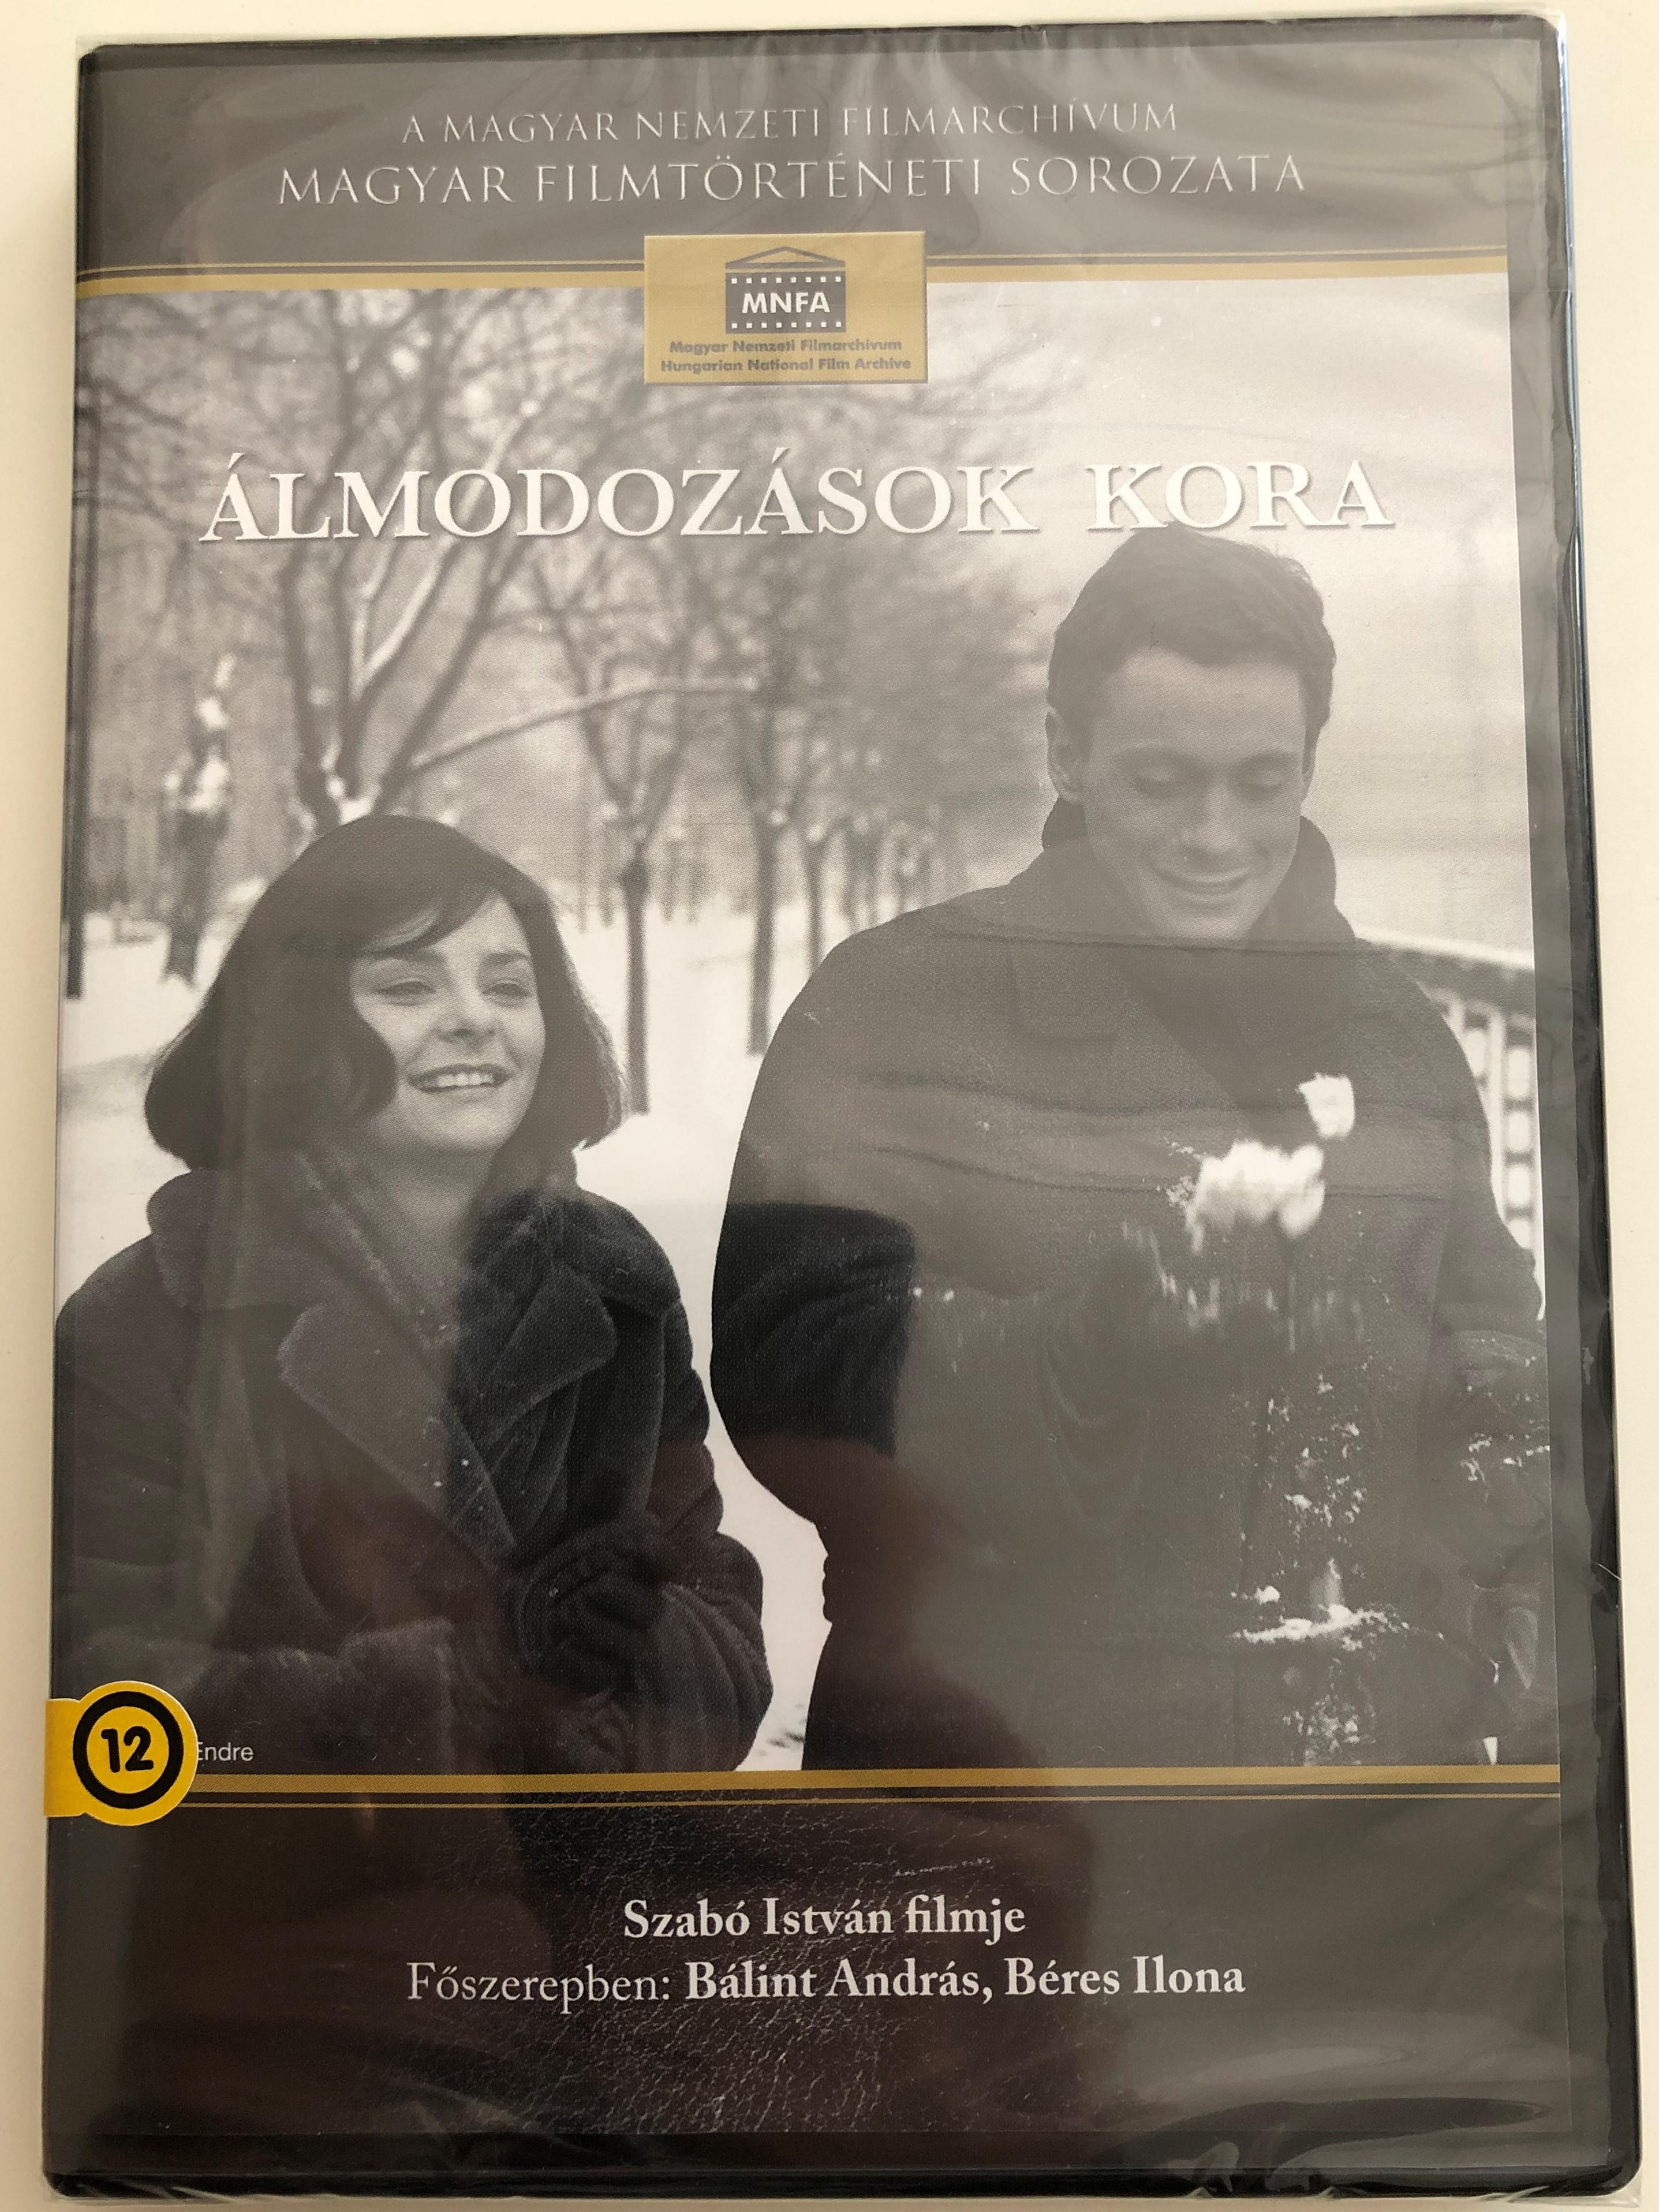 lmodoz-sok-kora-dvd-1964-age-of-daydreaming-written-directed-by-szab-istv-n-starring-b-lint-andr-s-b-res-ilona-hal-sz-judit-s-lyom-kati-sinkovits-imre-bujtor-istv-n-1-.jpg